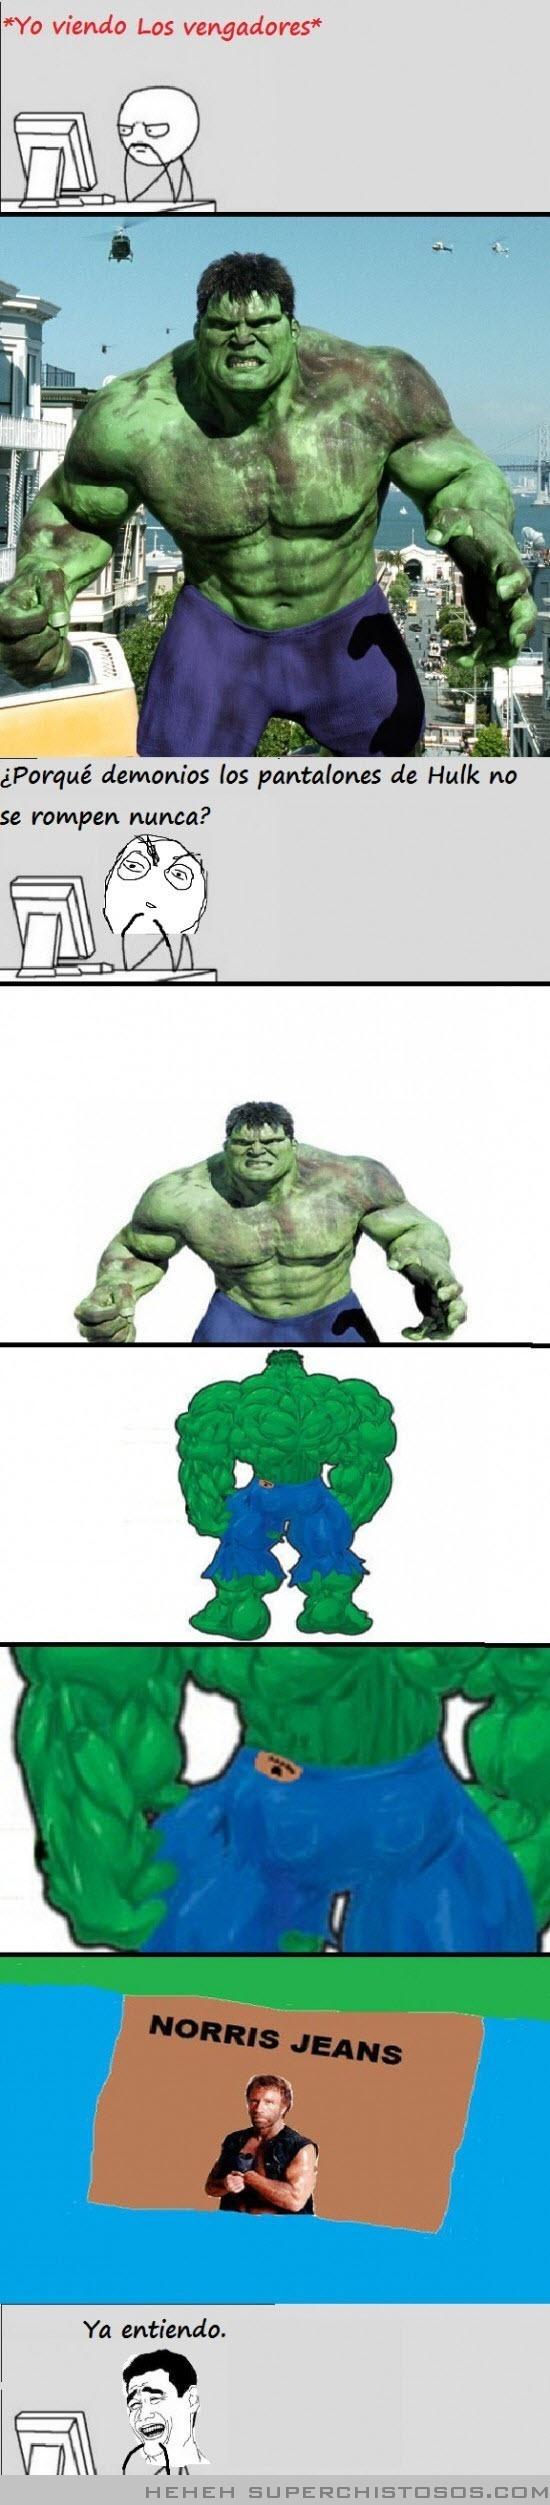 Los pantalones de Hulk